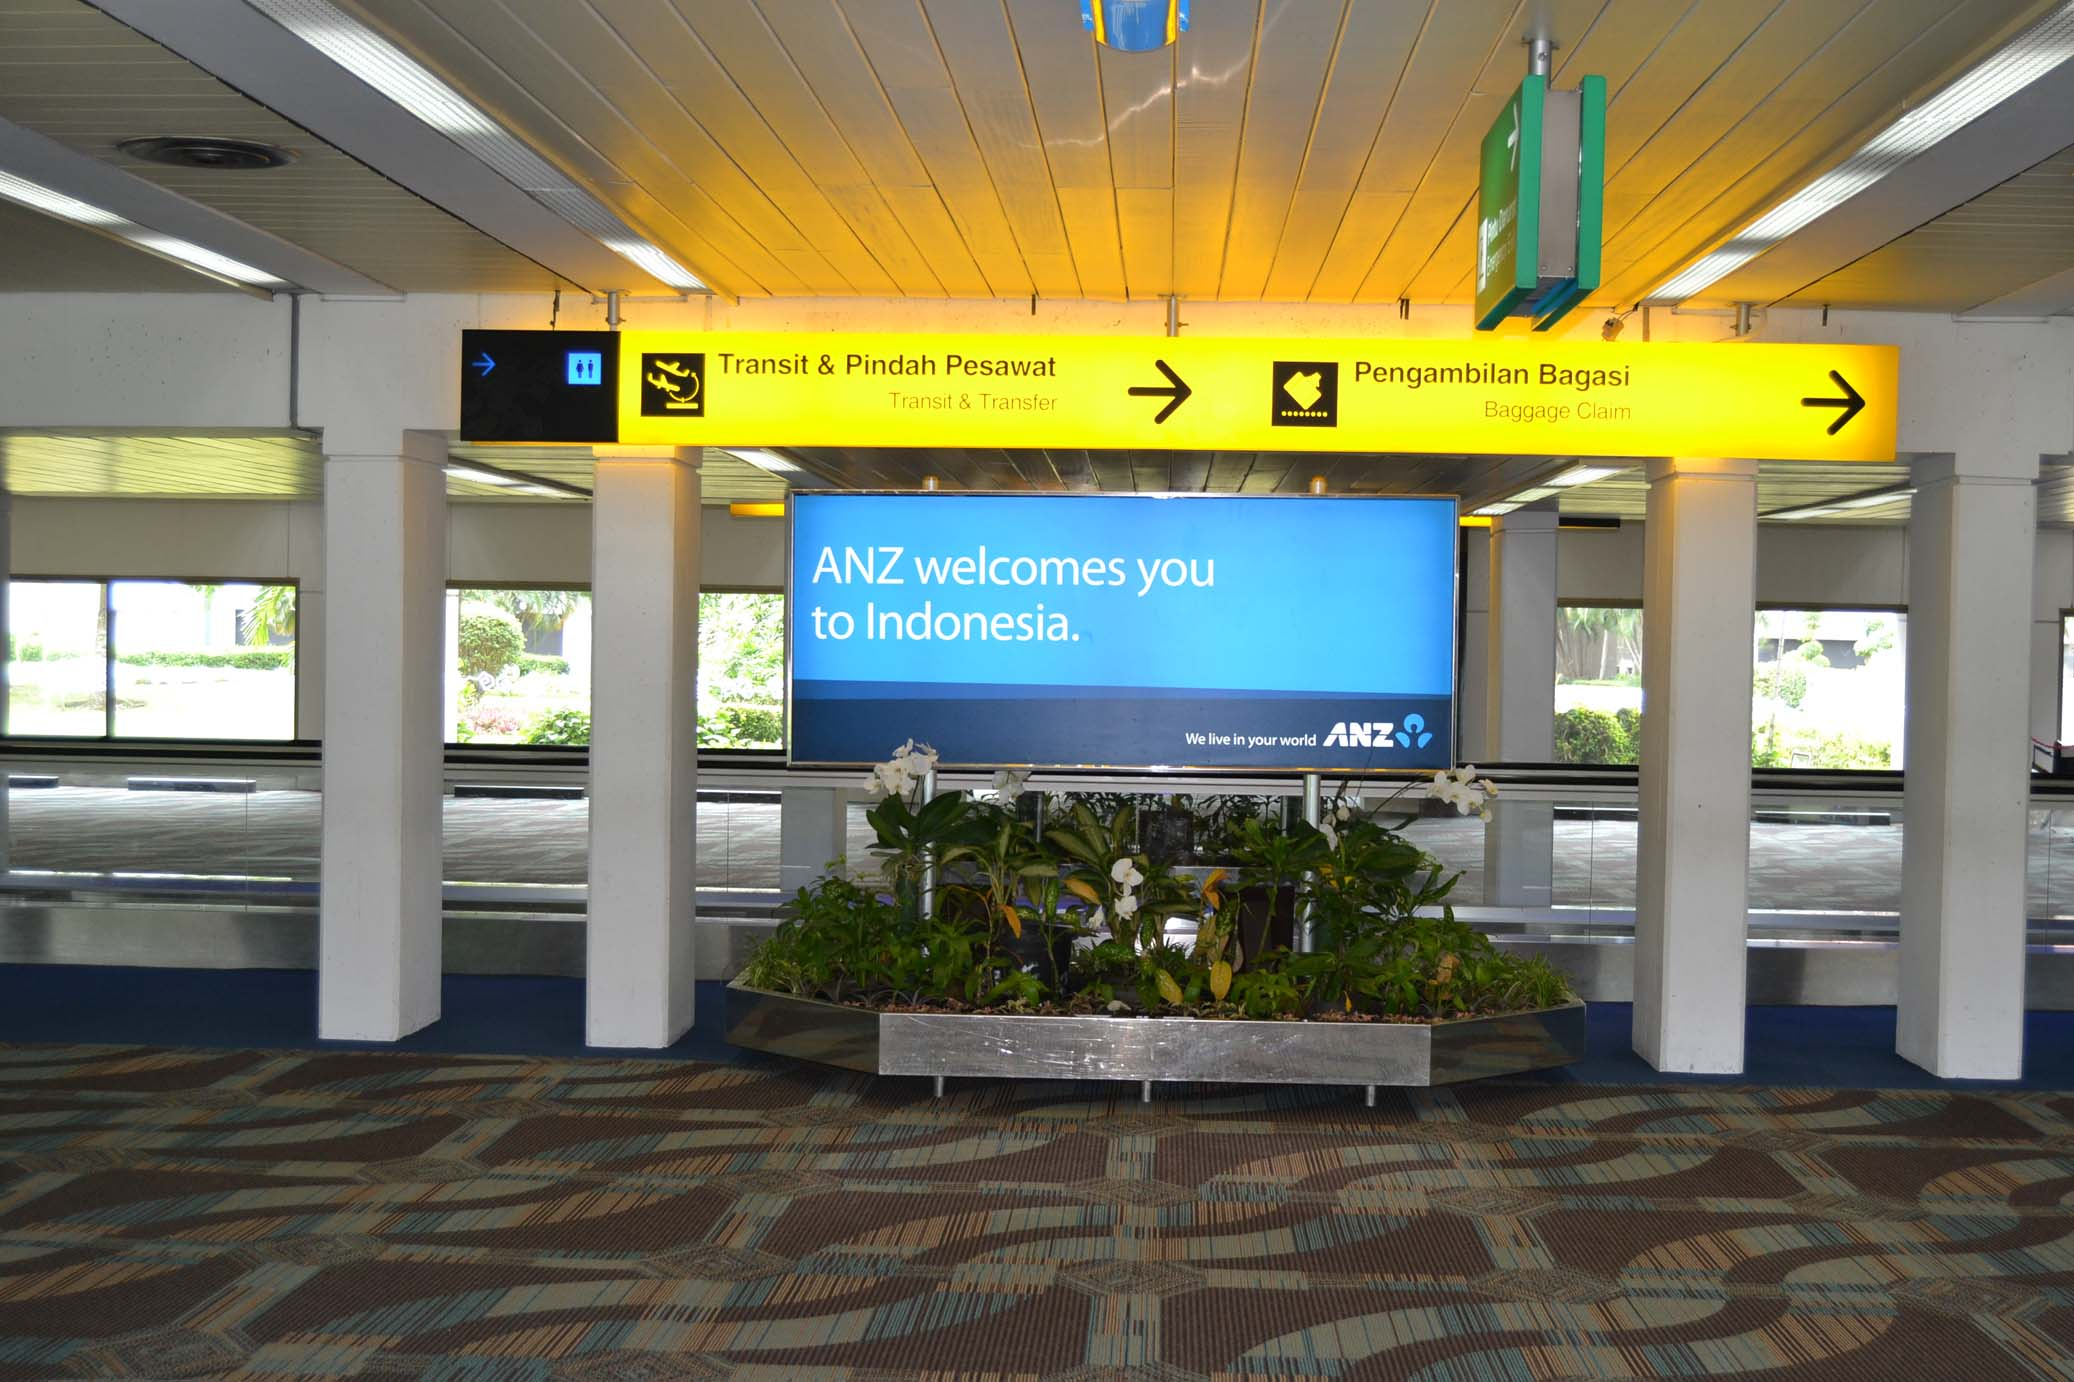 Plasma Airport - Plasma Outdoor Advertising